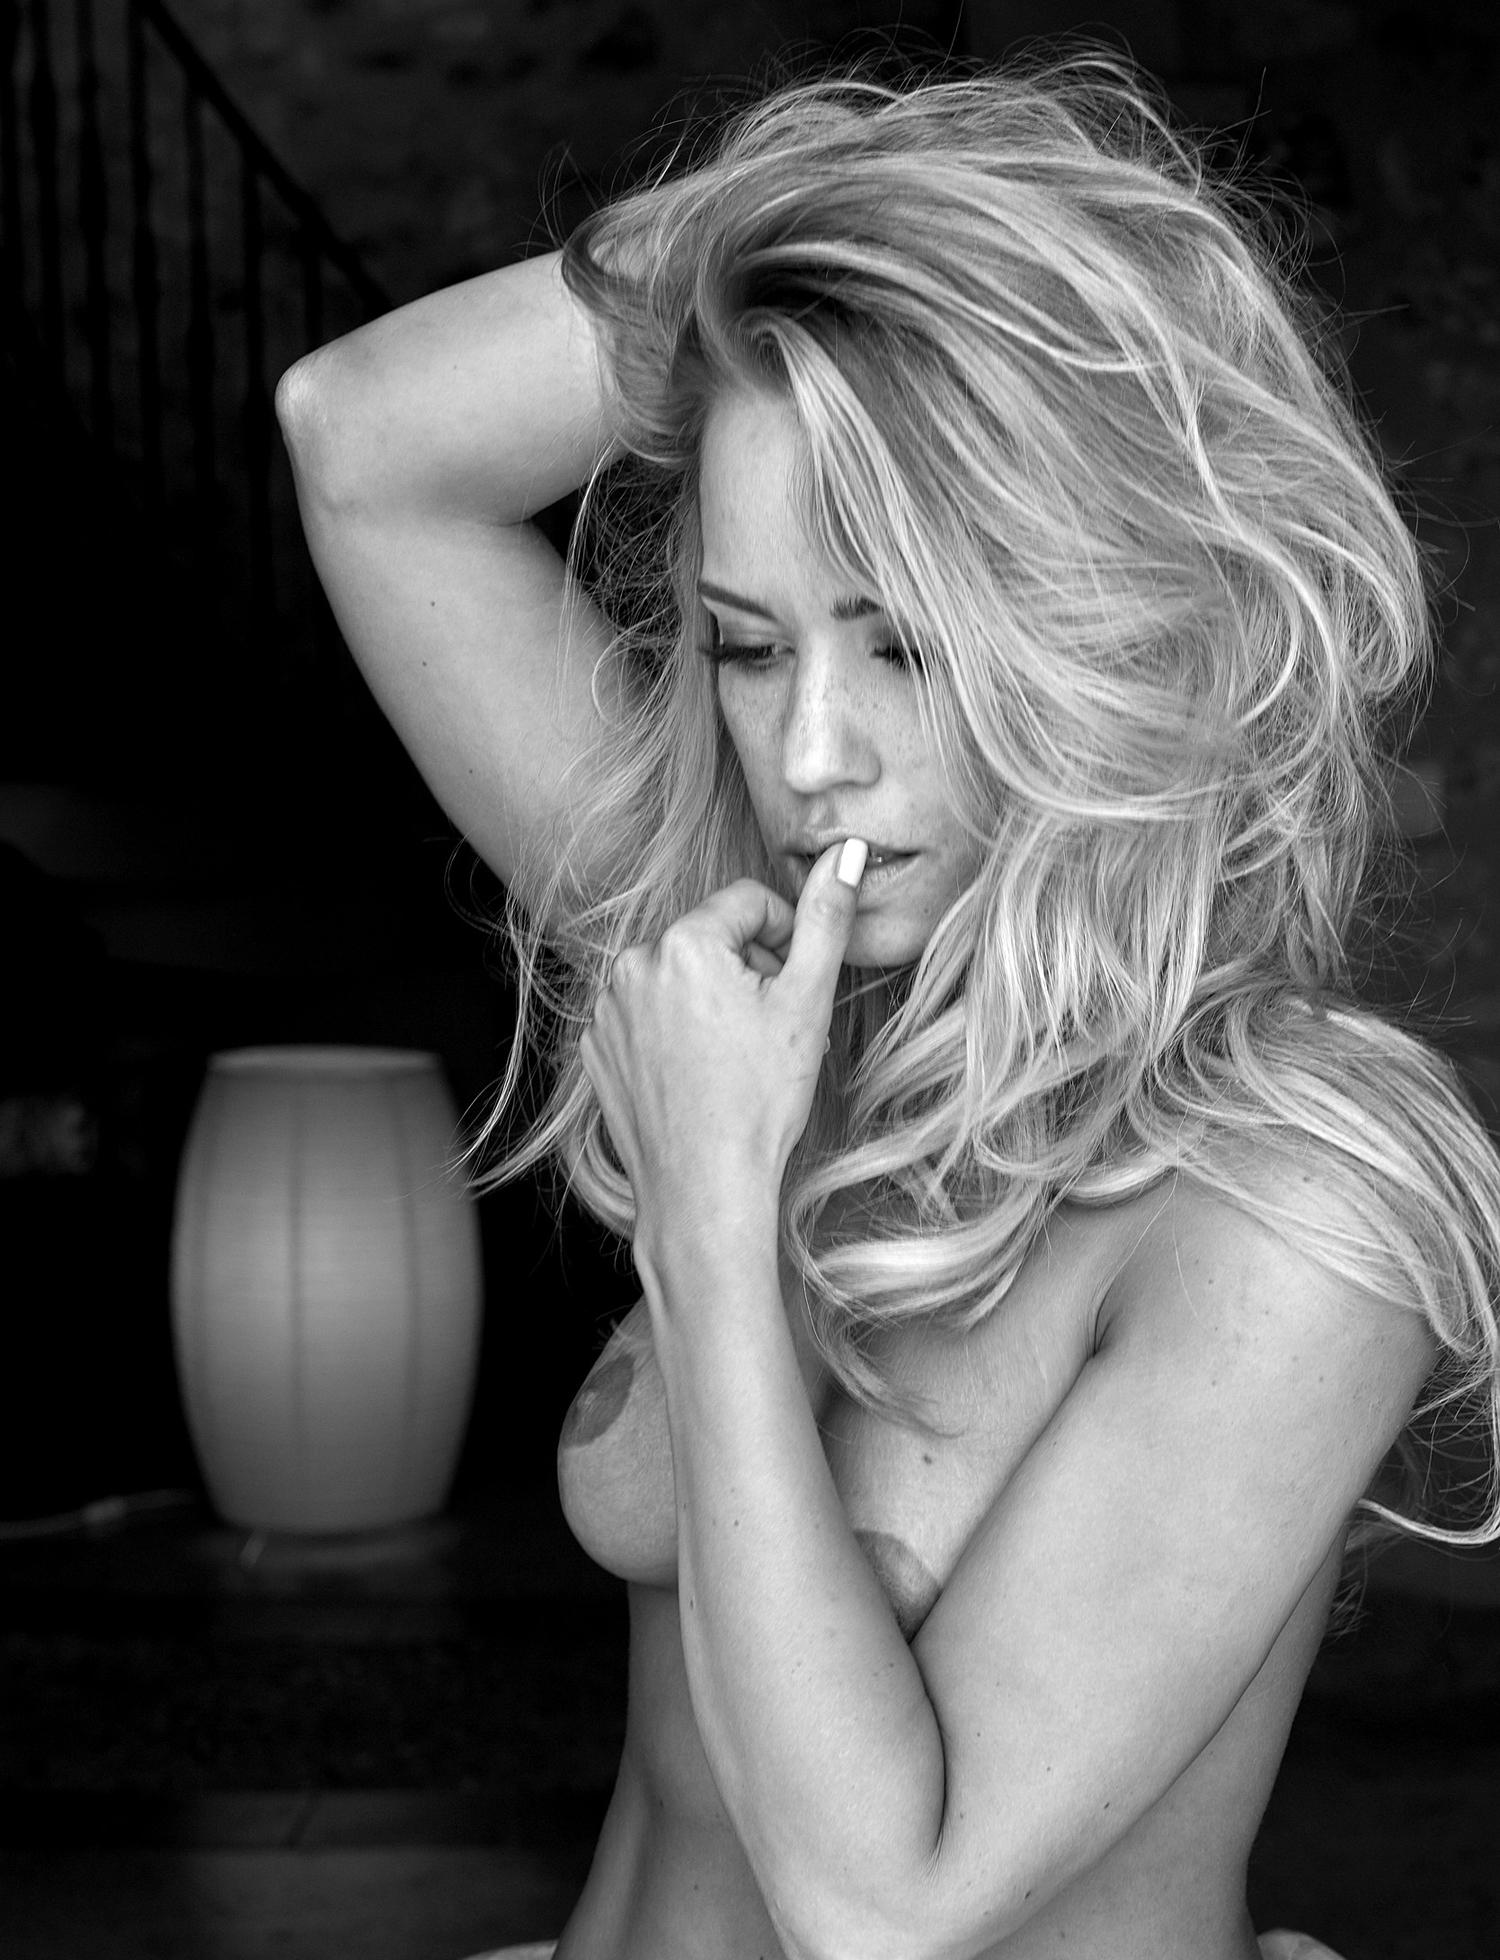 Lara-Isabelle Rentinck Nackt. Foto - 38